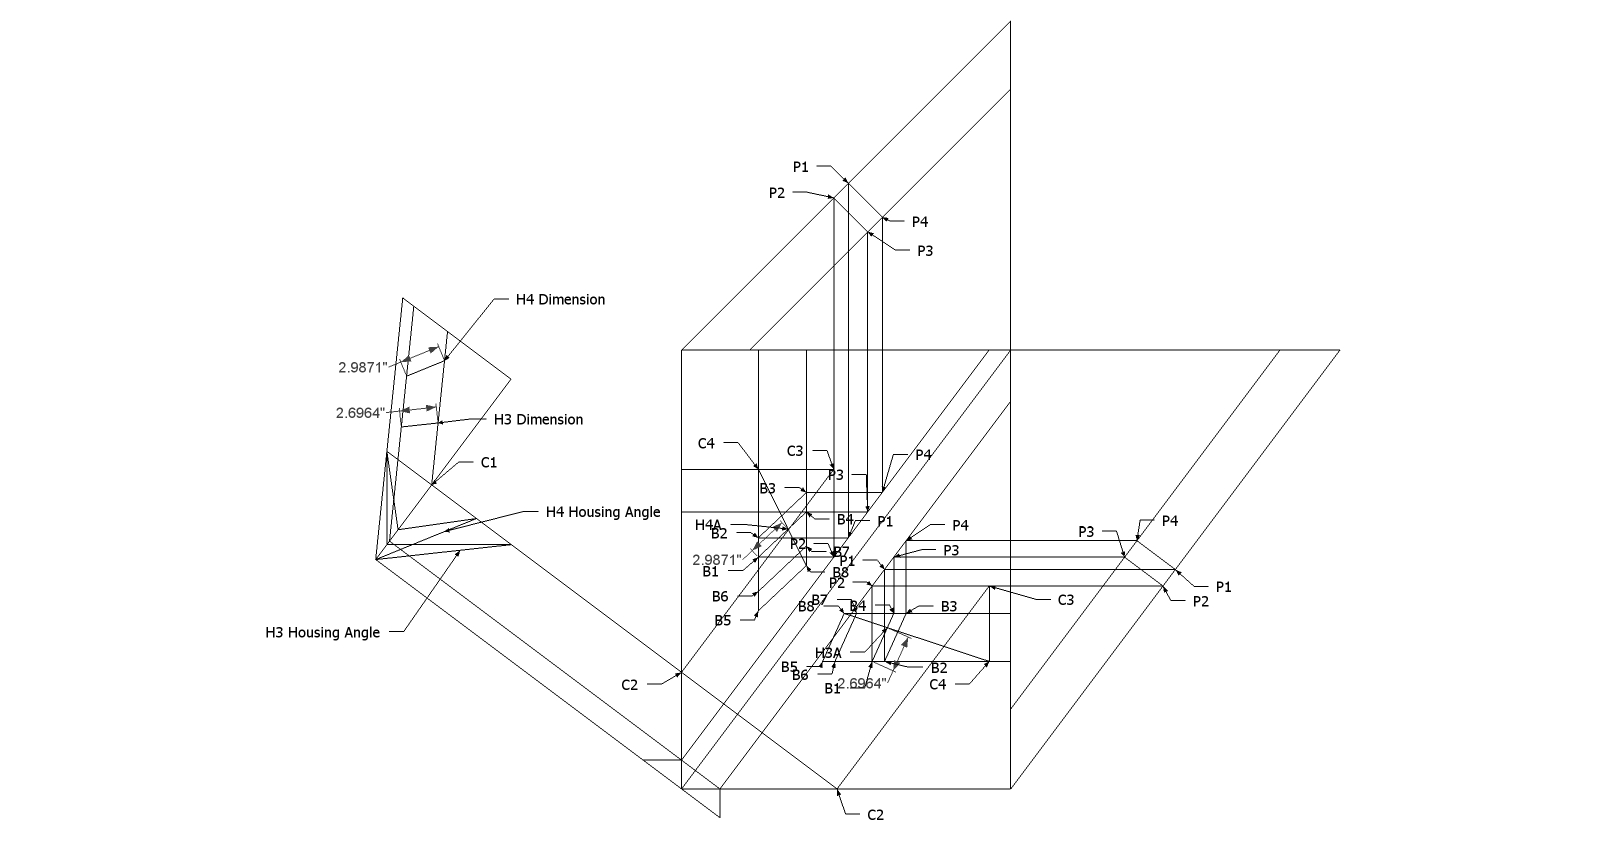 roof framing geometry [ 1600 x 844 Pixel ]